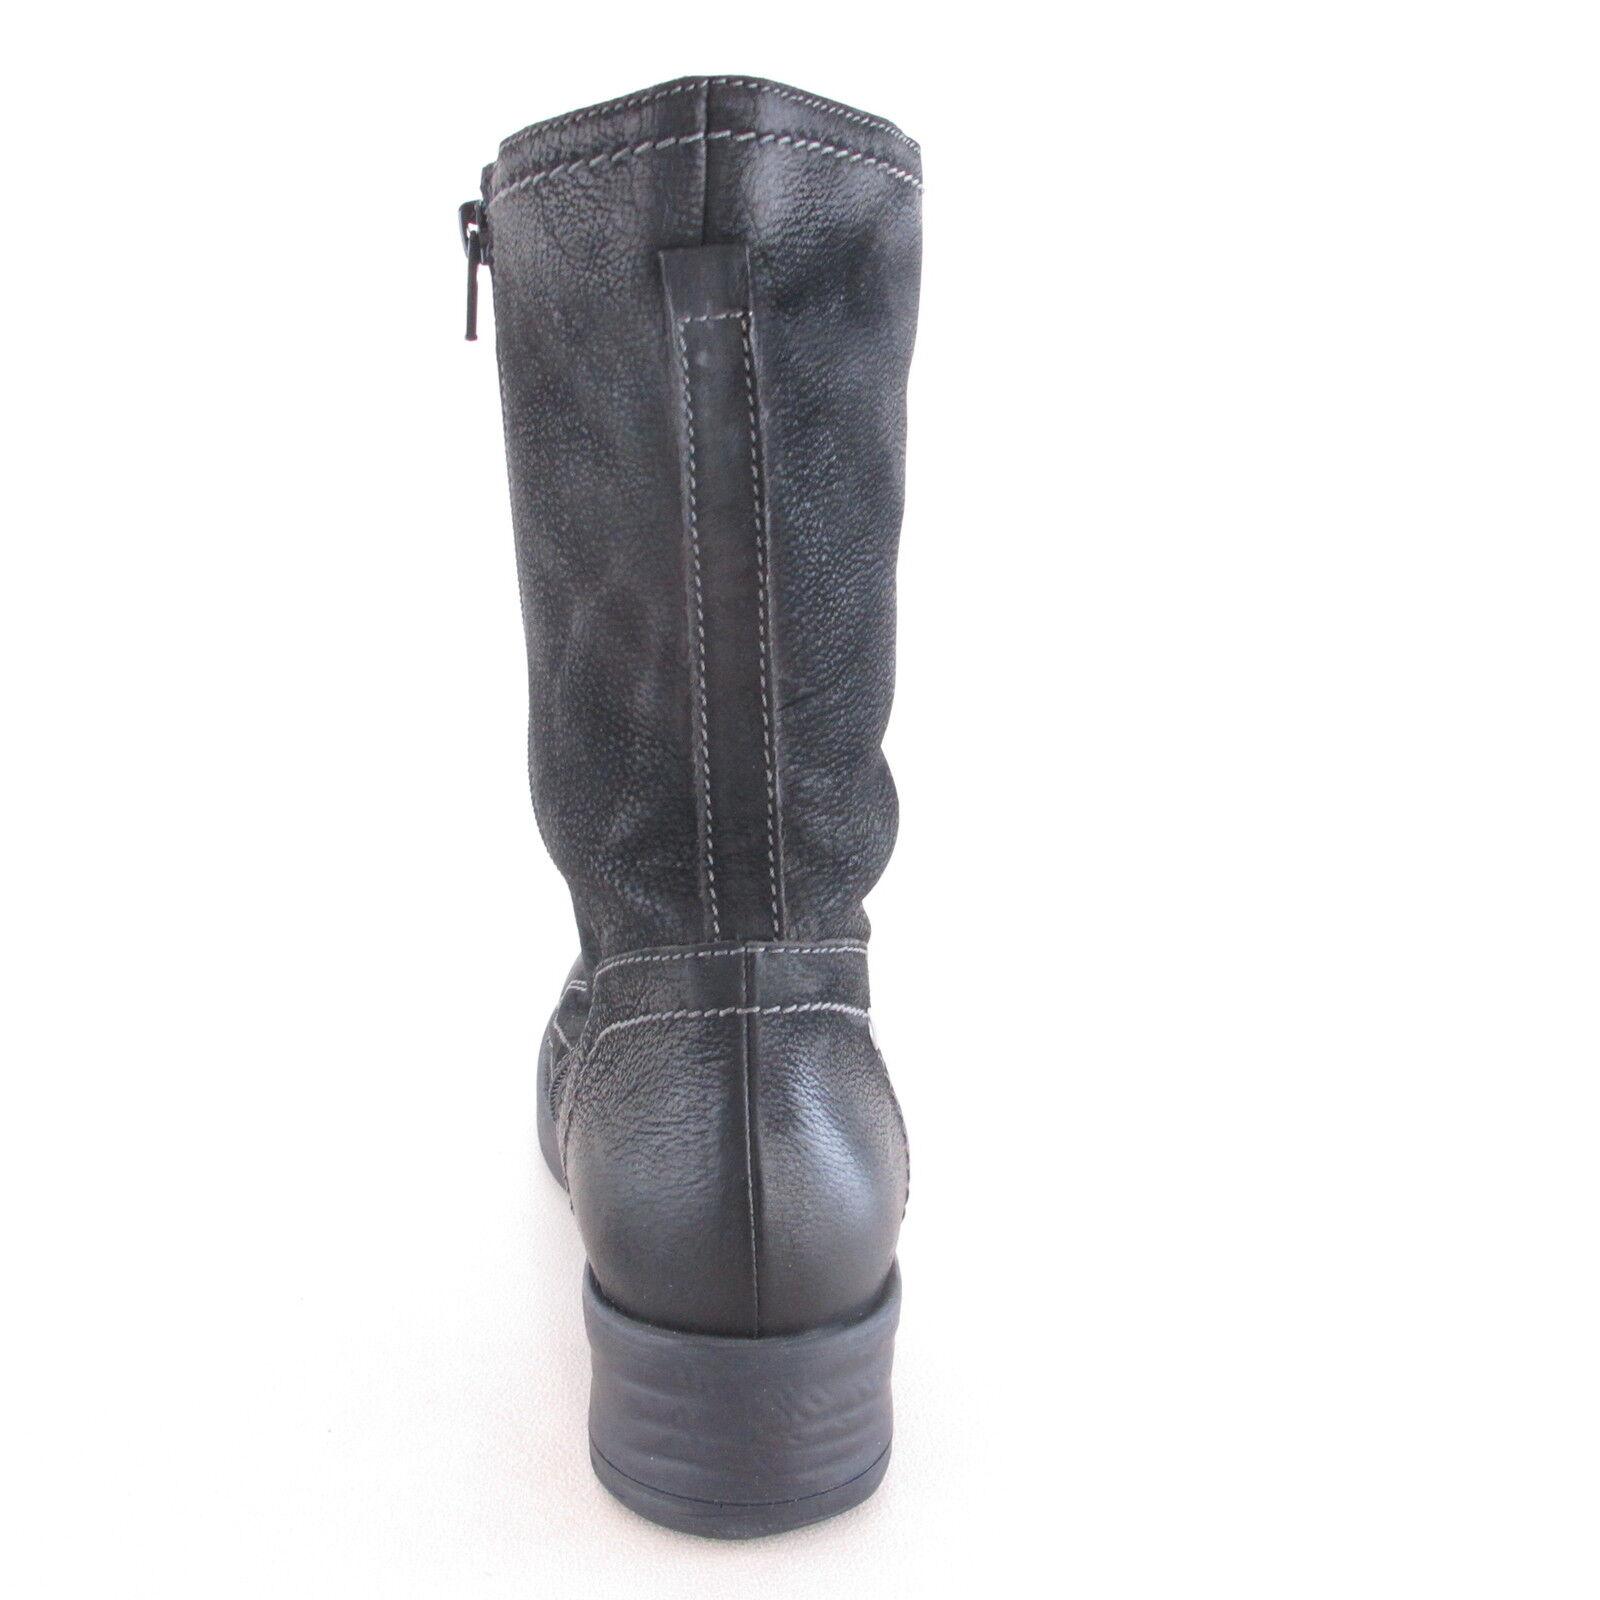 463a5b537 ... Tamaris brevemente botas nuevo nobuck-cuero zapatos señora botas de  caña ata ...